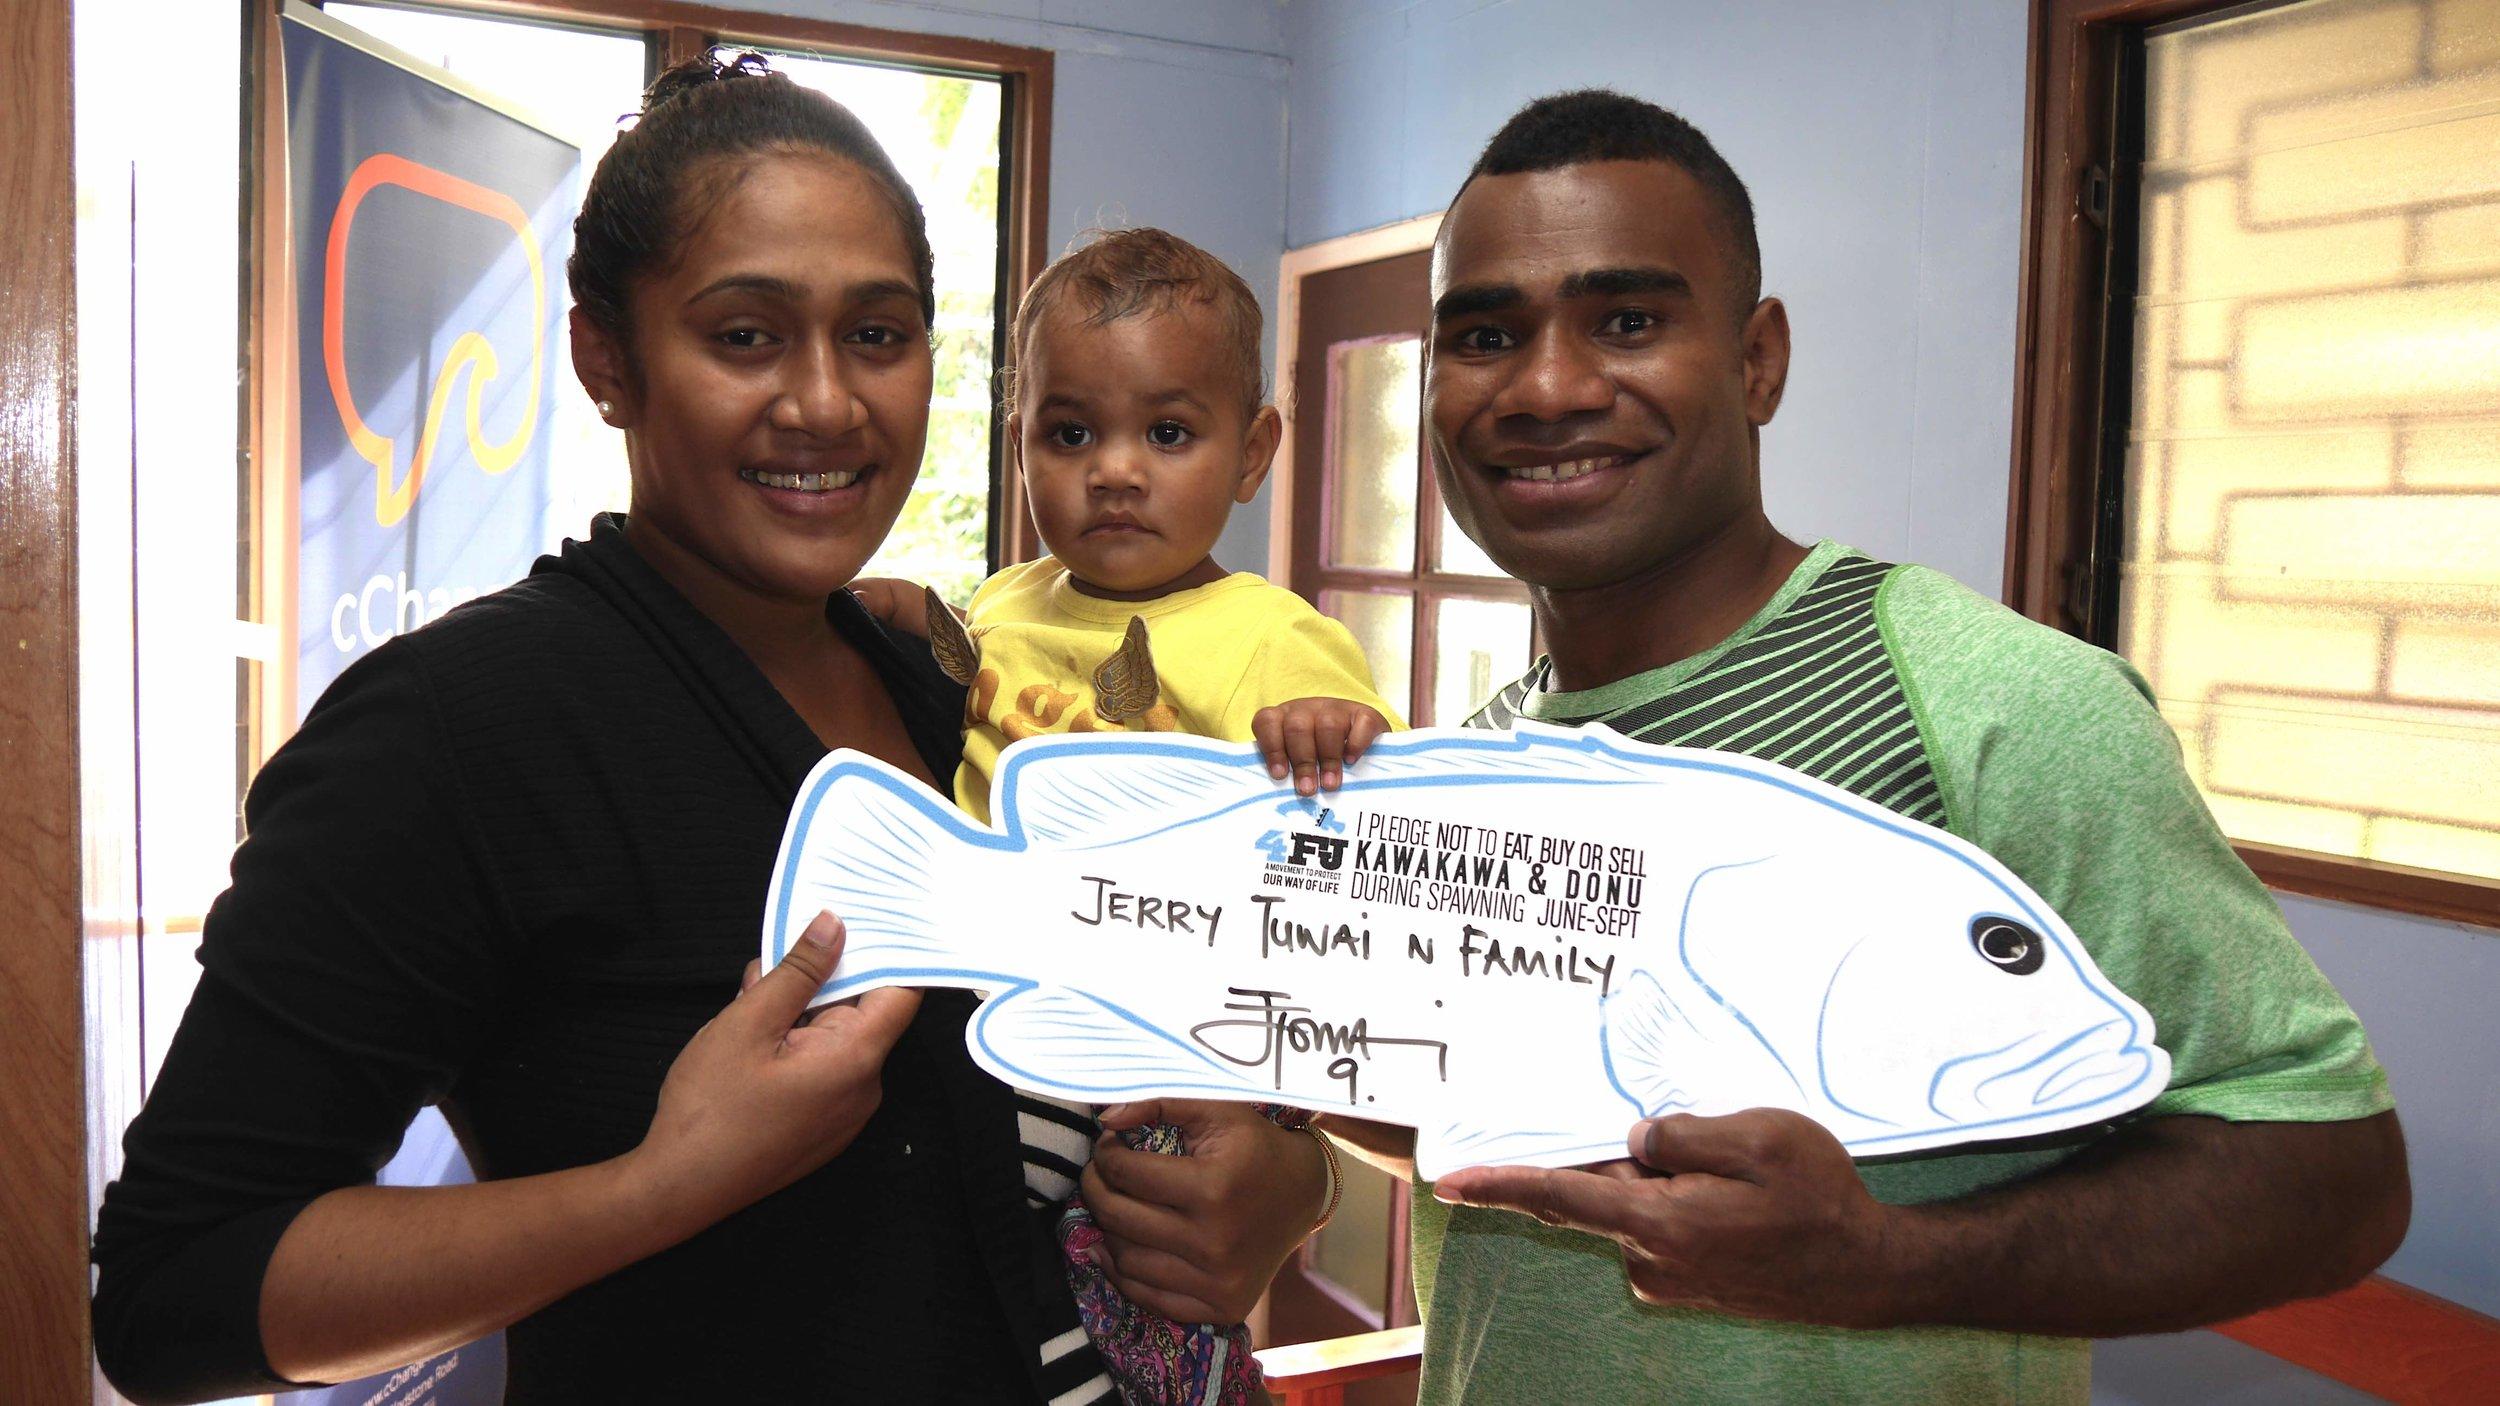 Fiji 7s Captain Jerry Tuwai takes the 4FJ pledge not to eat kawakawa and donu during breeding season.